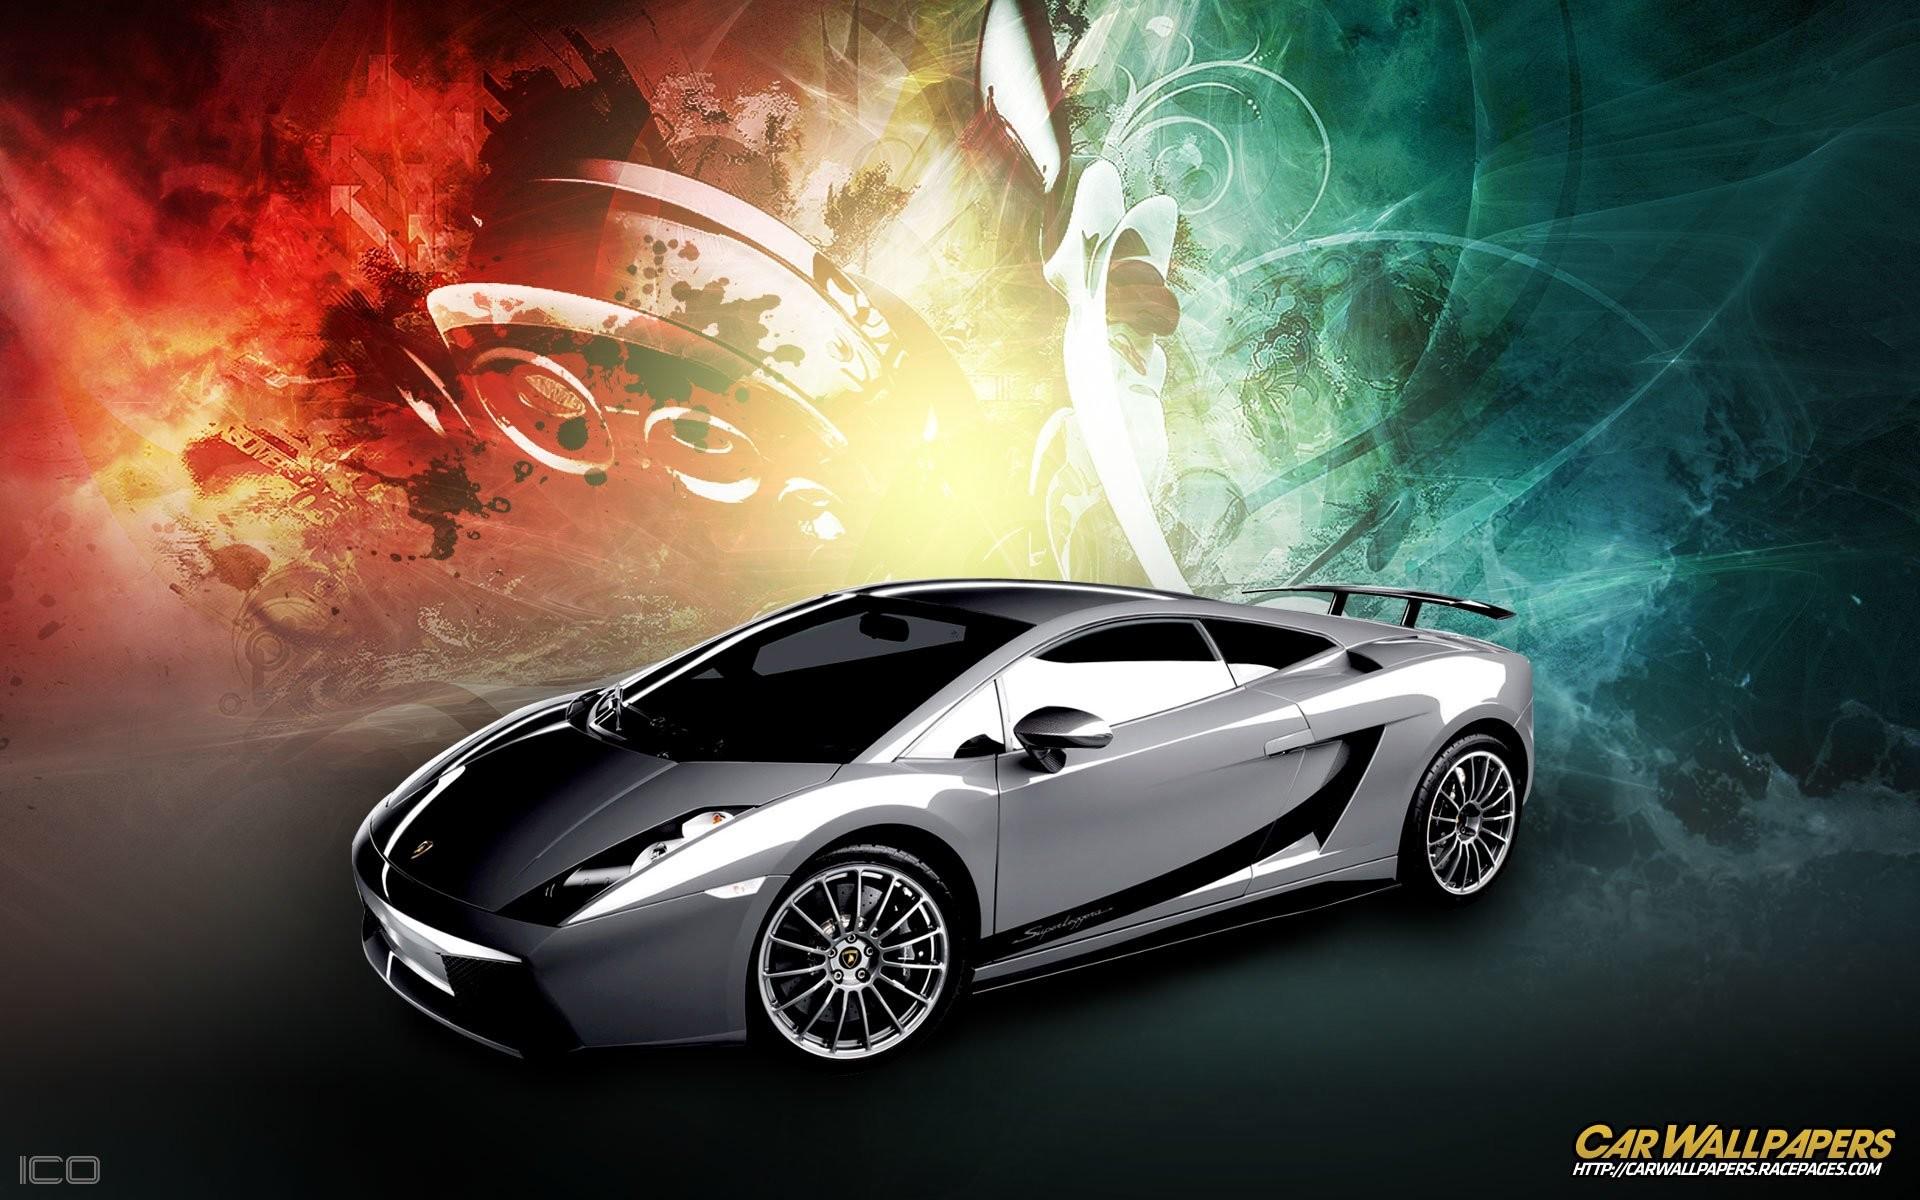 Black Lamborghini Aventador Supercar HD desktop wallpaper High